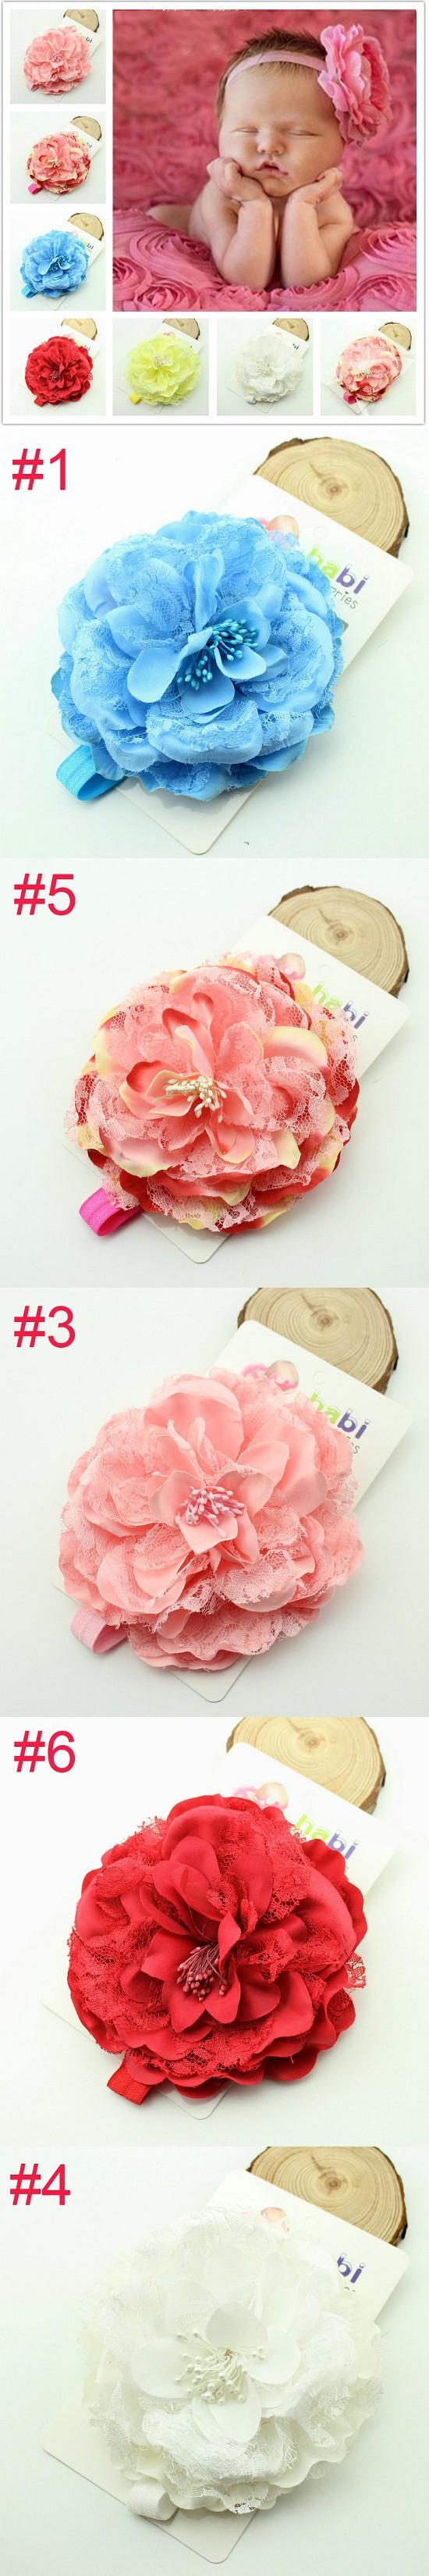 Pink Baby Headbands Big Flower Headband Lace hairband Infant Children hair accessories Photo Prop 12pcs/lot HB192